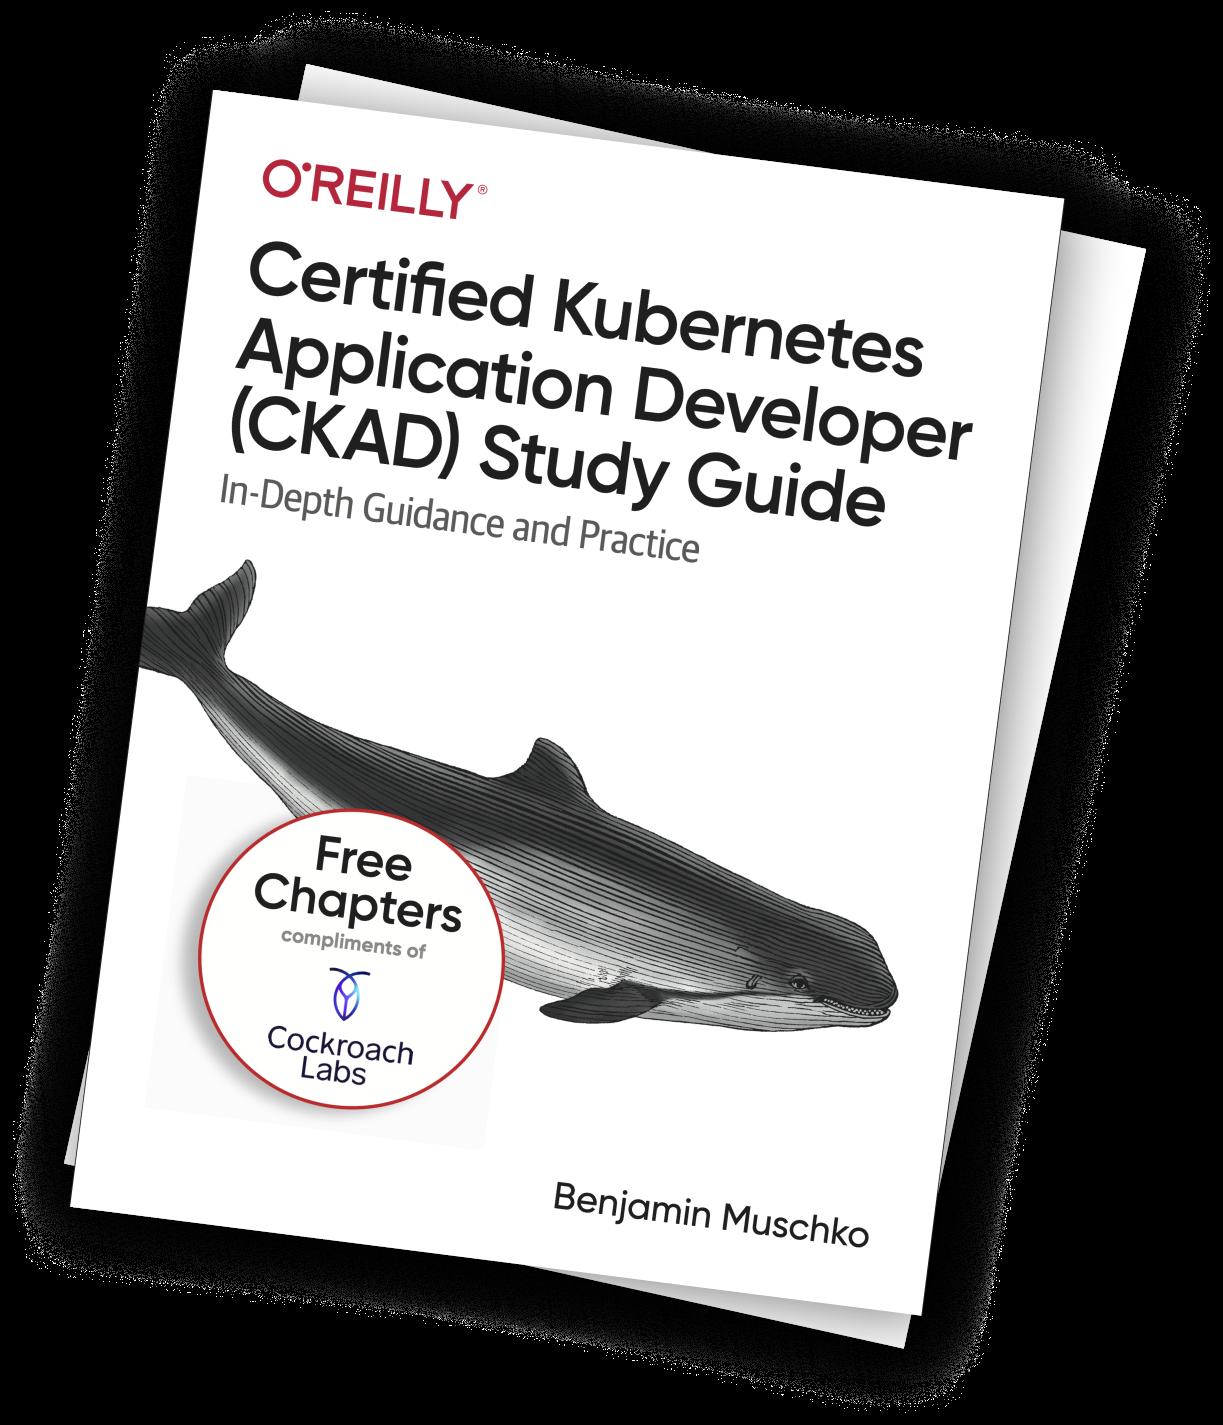 Certified Kubernetes Application Developer | O'Reilly eBook Excerpt